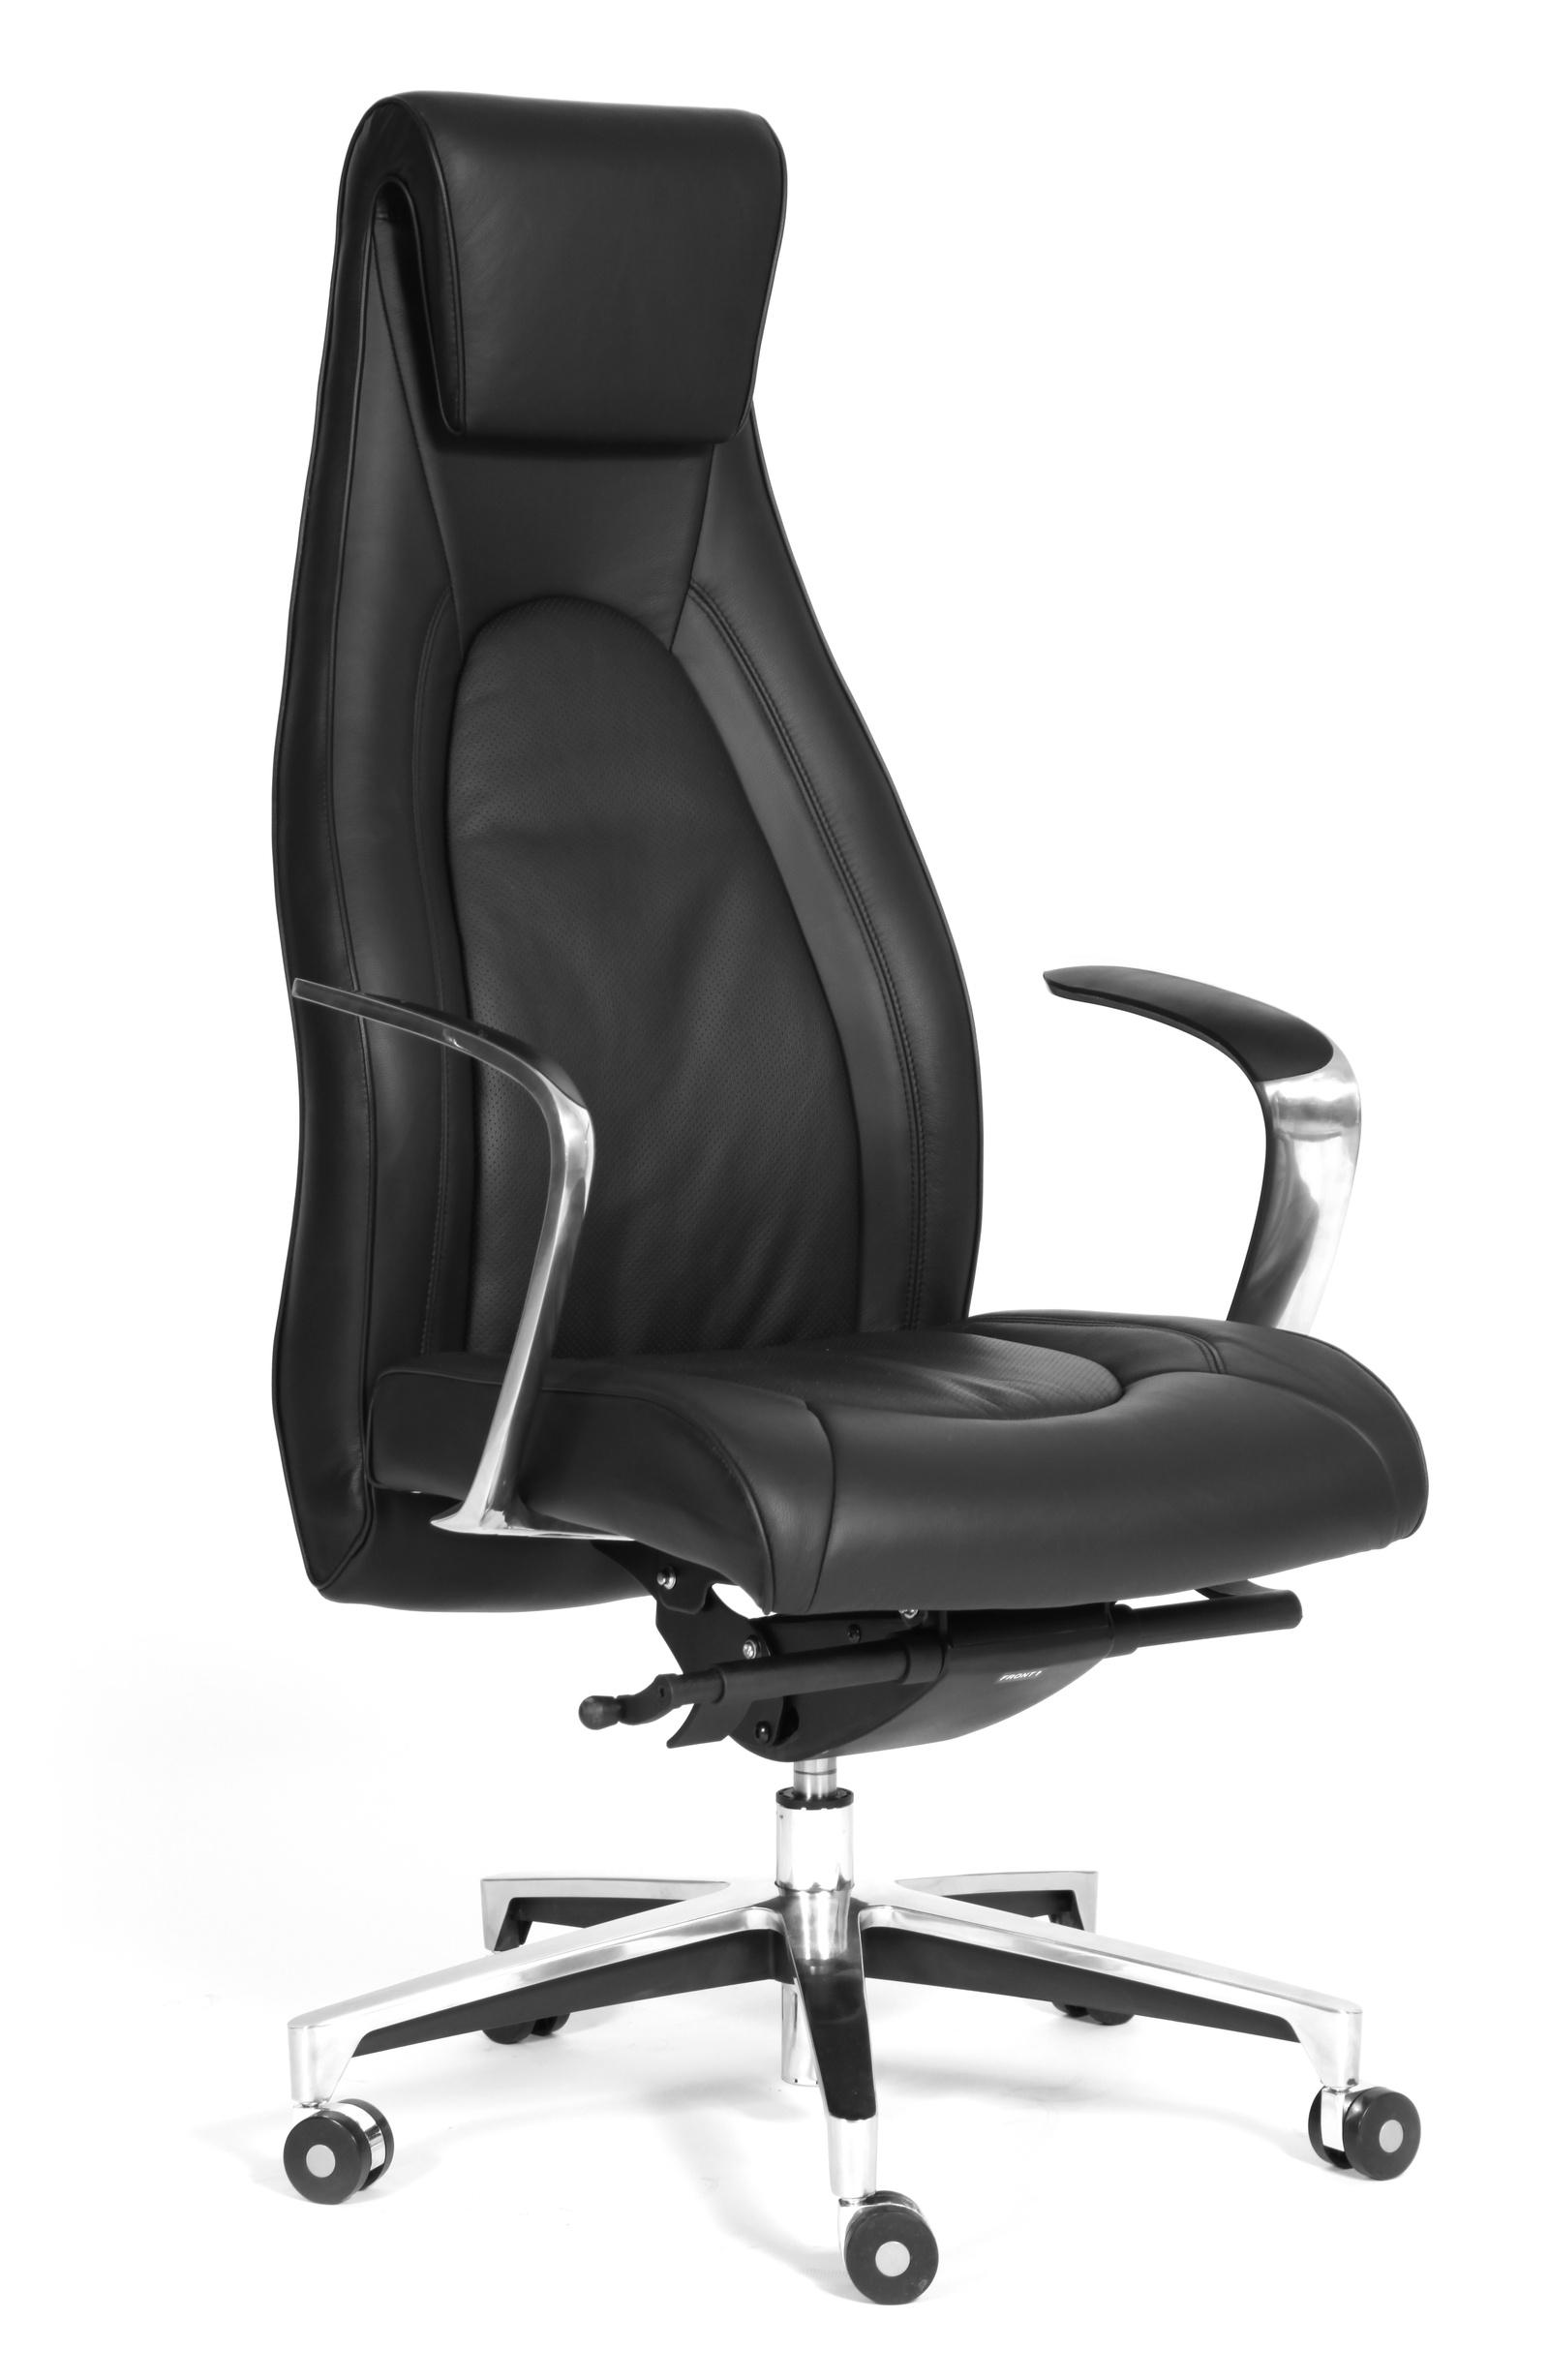 Офисное кресло CHAIRMAN FUGA офисное кресло chairman fuga черный